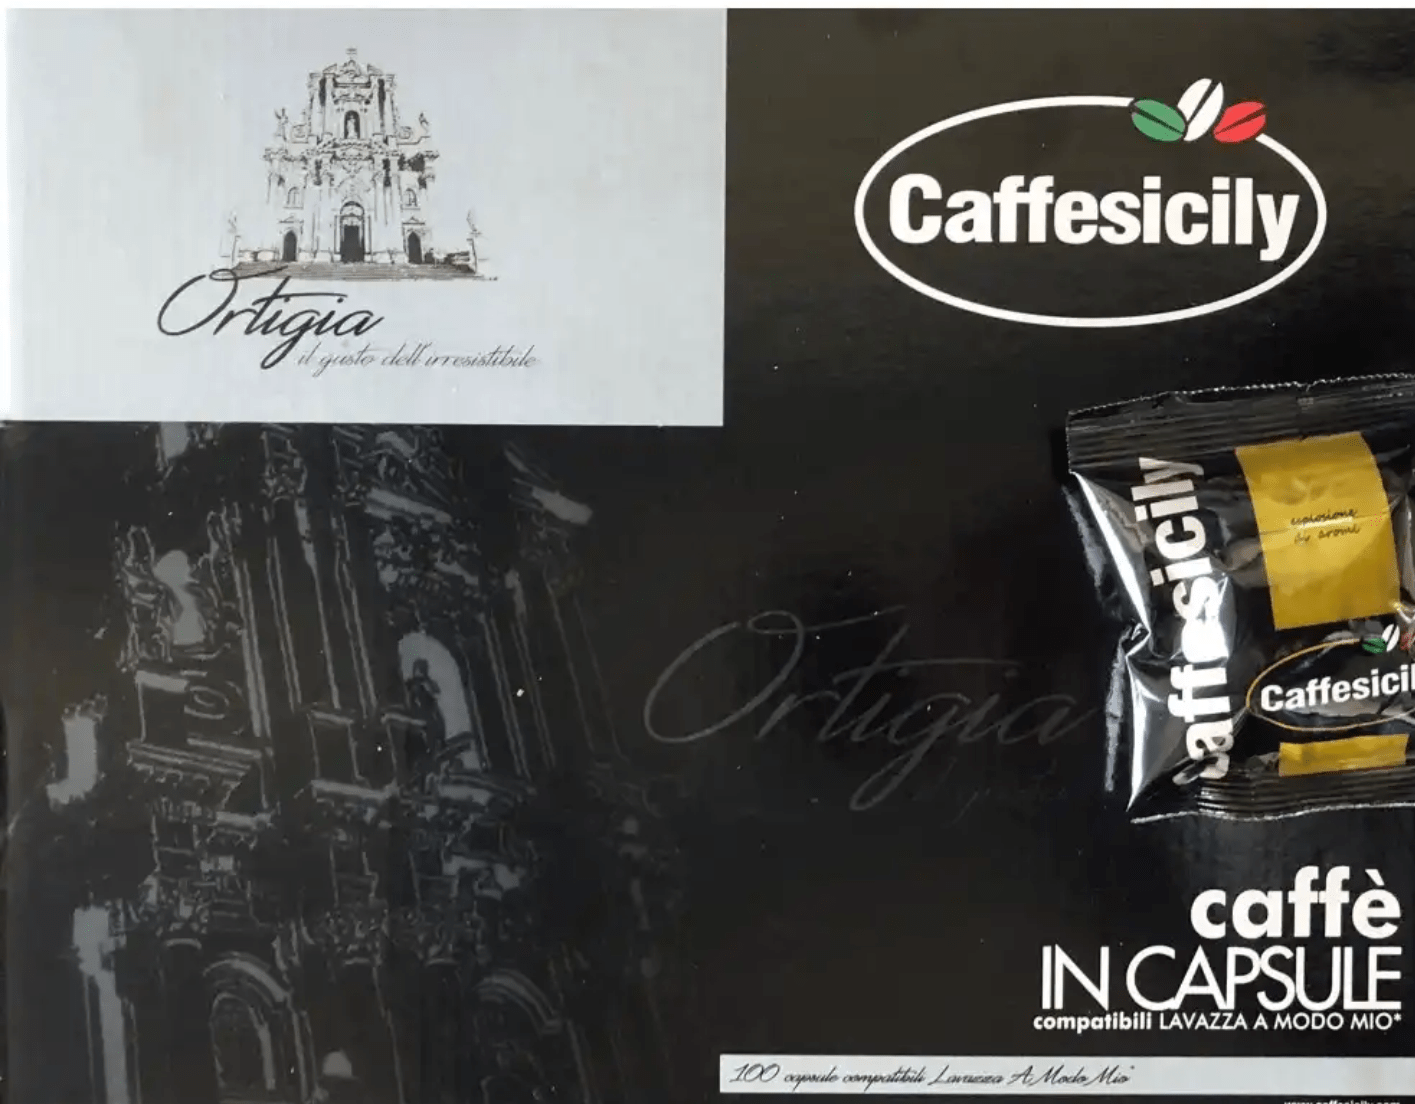 100 CAPSULE COMPATIBILI A MODO MIO CAFFESICILY ORTIGIA MISCELA NERA